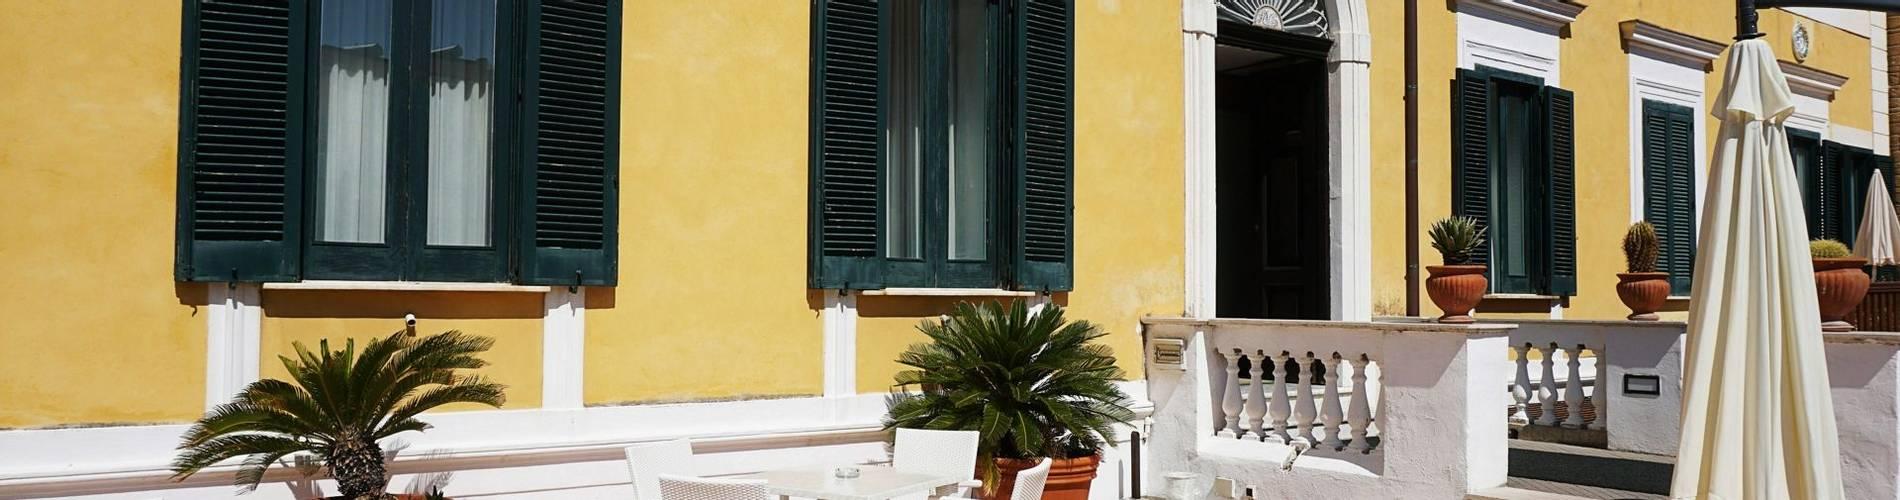 Villa Sirio, South Campania, Italy (19).jpg